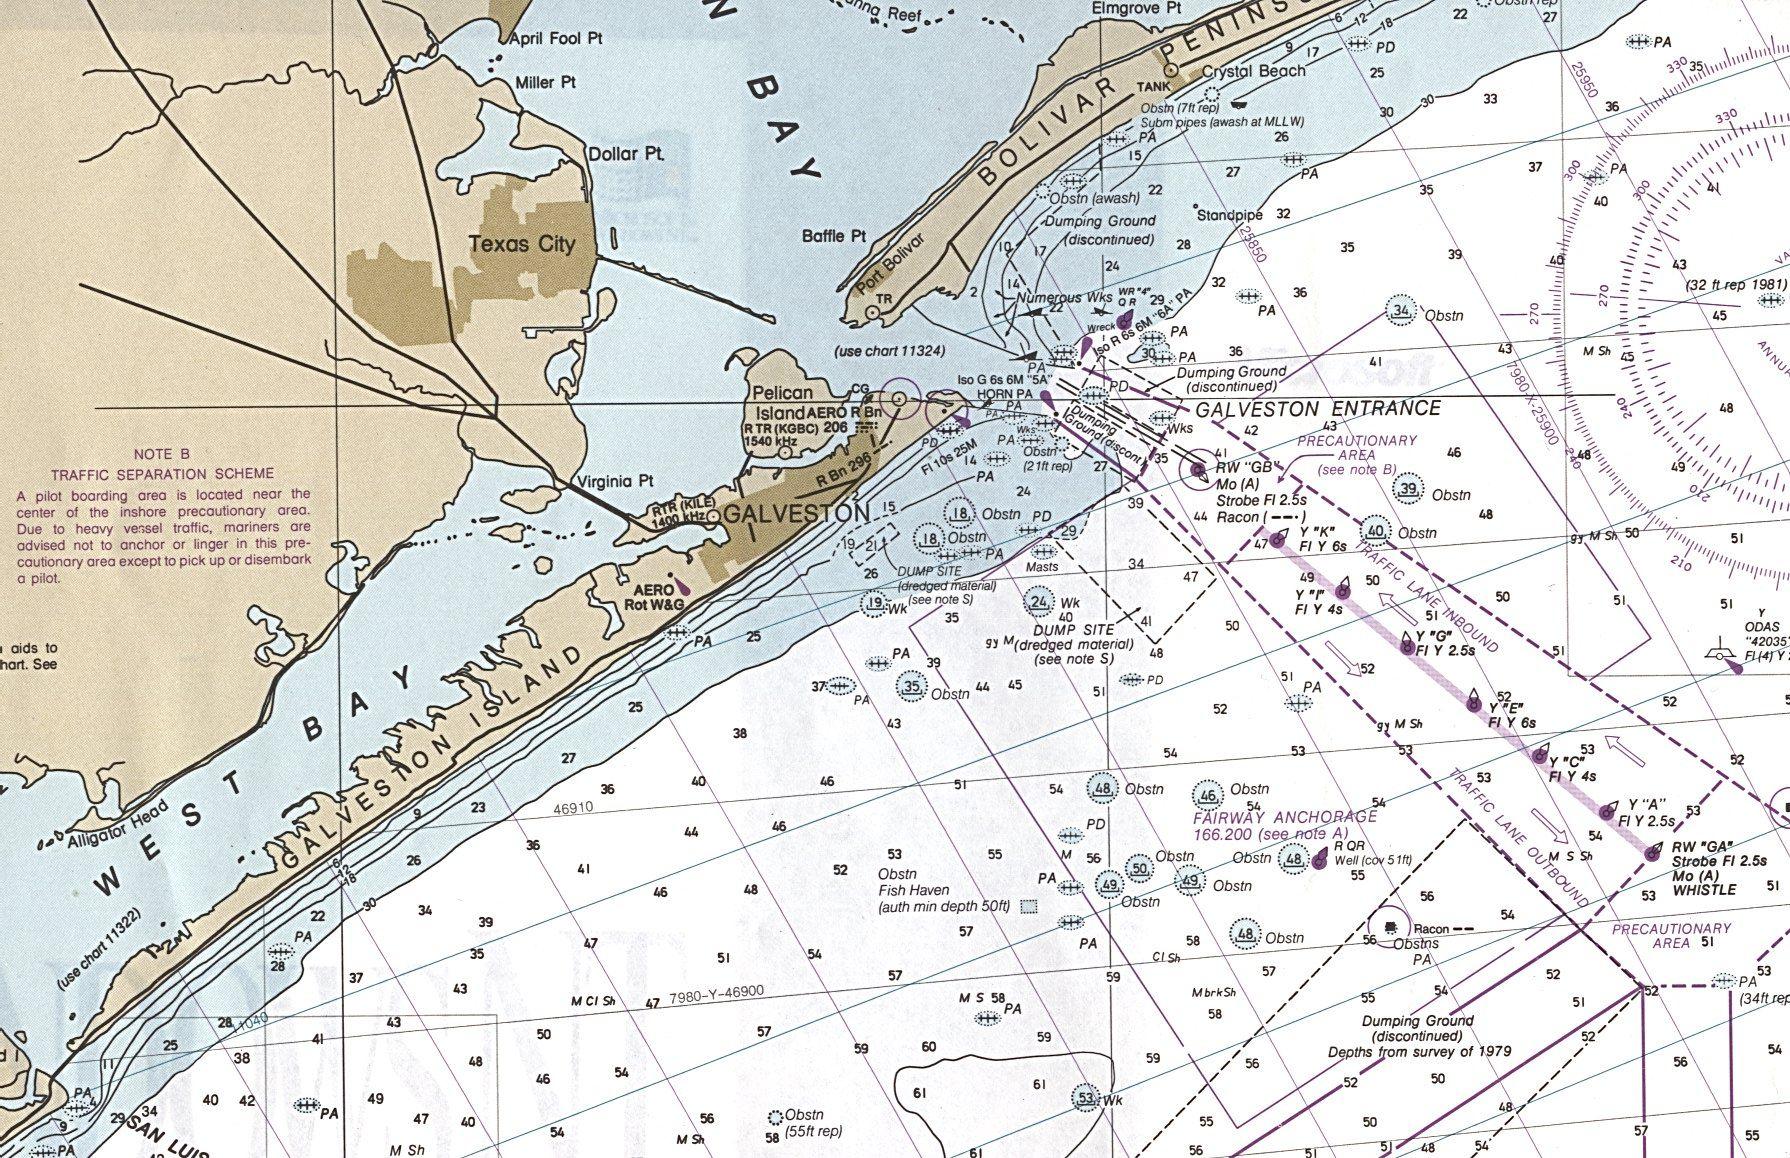 Galveston region texas nautical chart lived here as a child